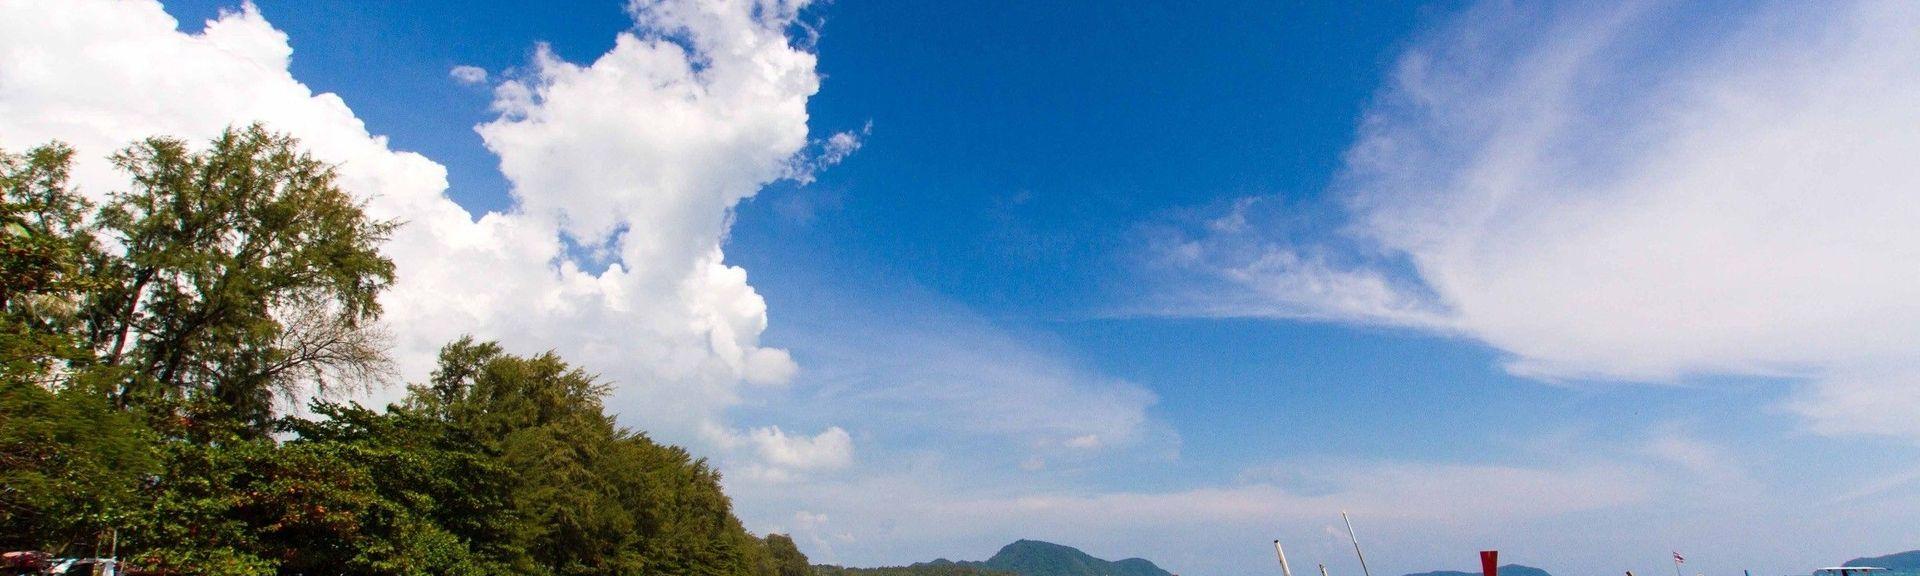 Rawain ranta, Rawai, Phuket (provinssi), Thaimaa